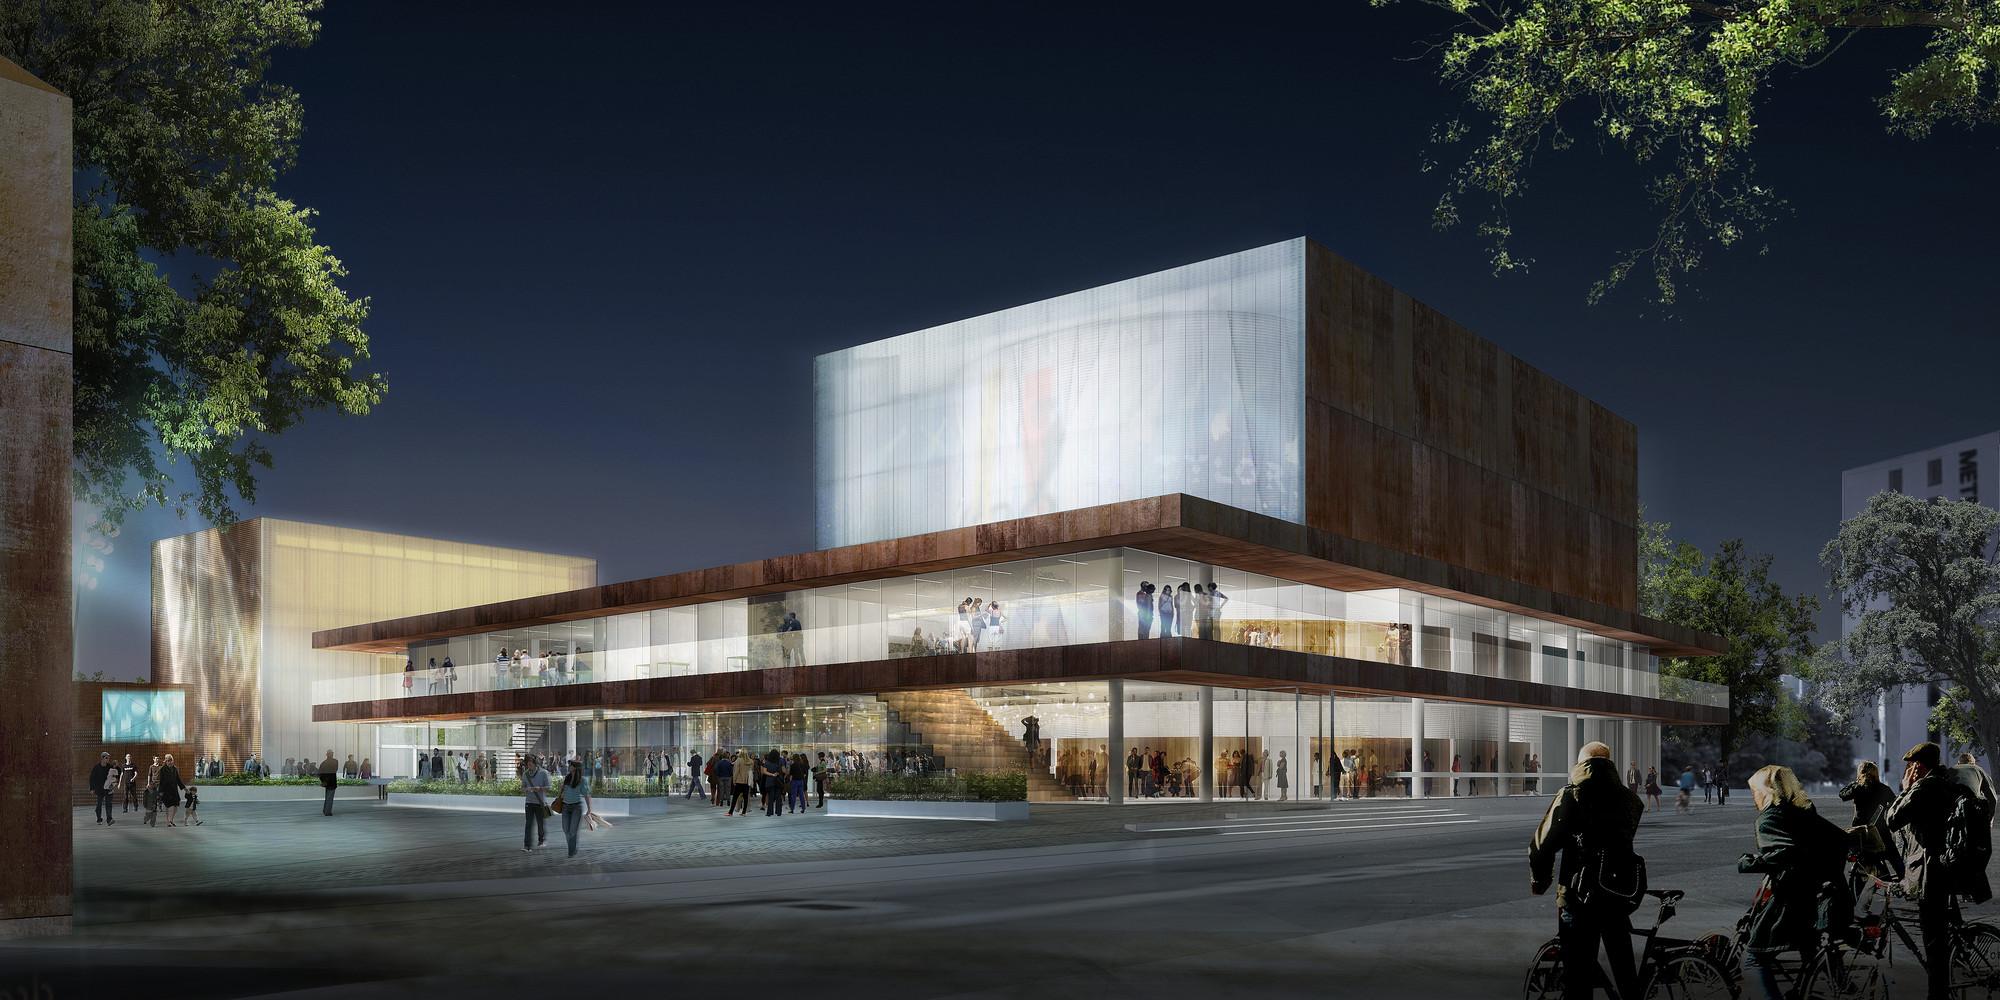 Schmidt Hammer Lassen Wins Competition to Design Danish Theater, Courtesy of Schmidt Hammer Lassen Architects